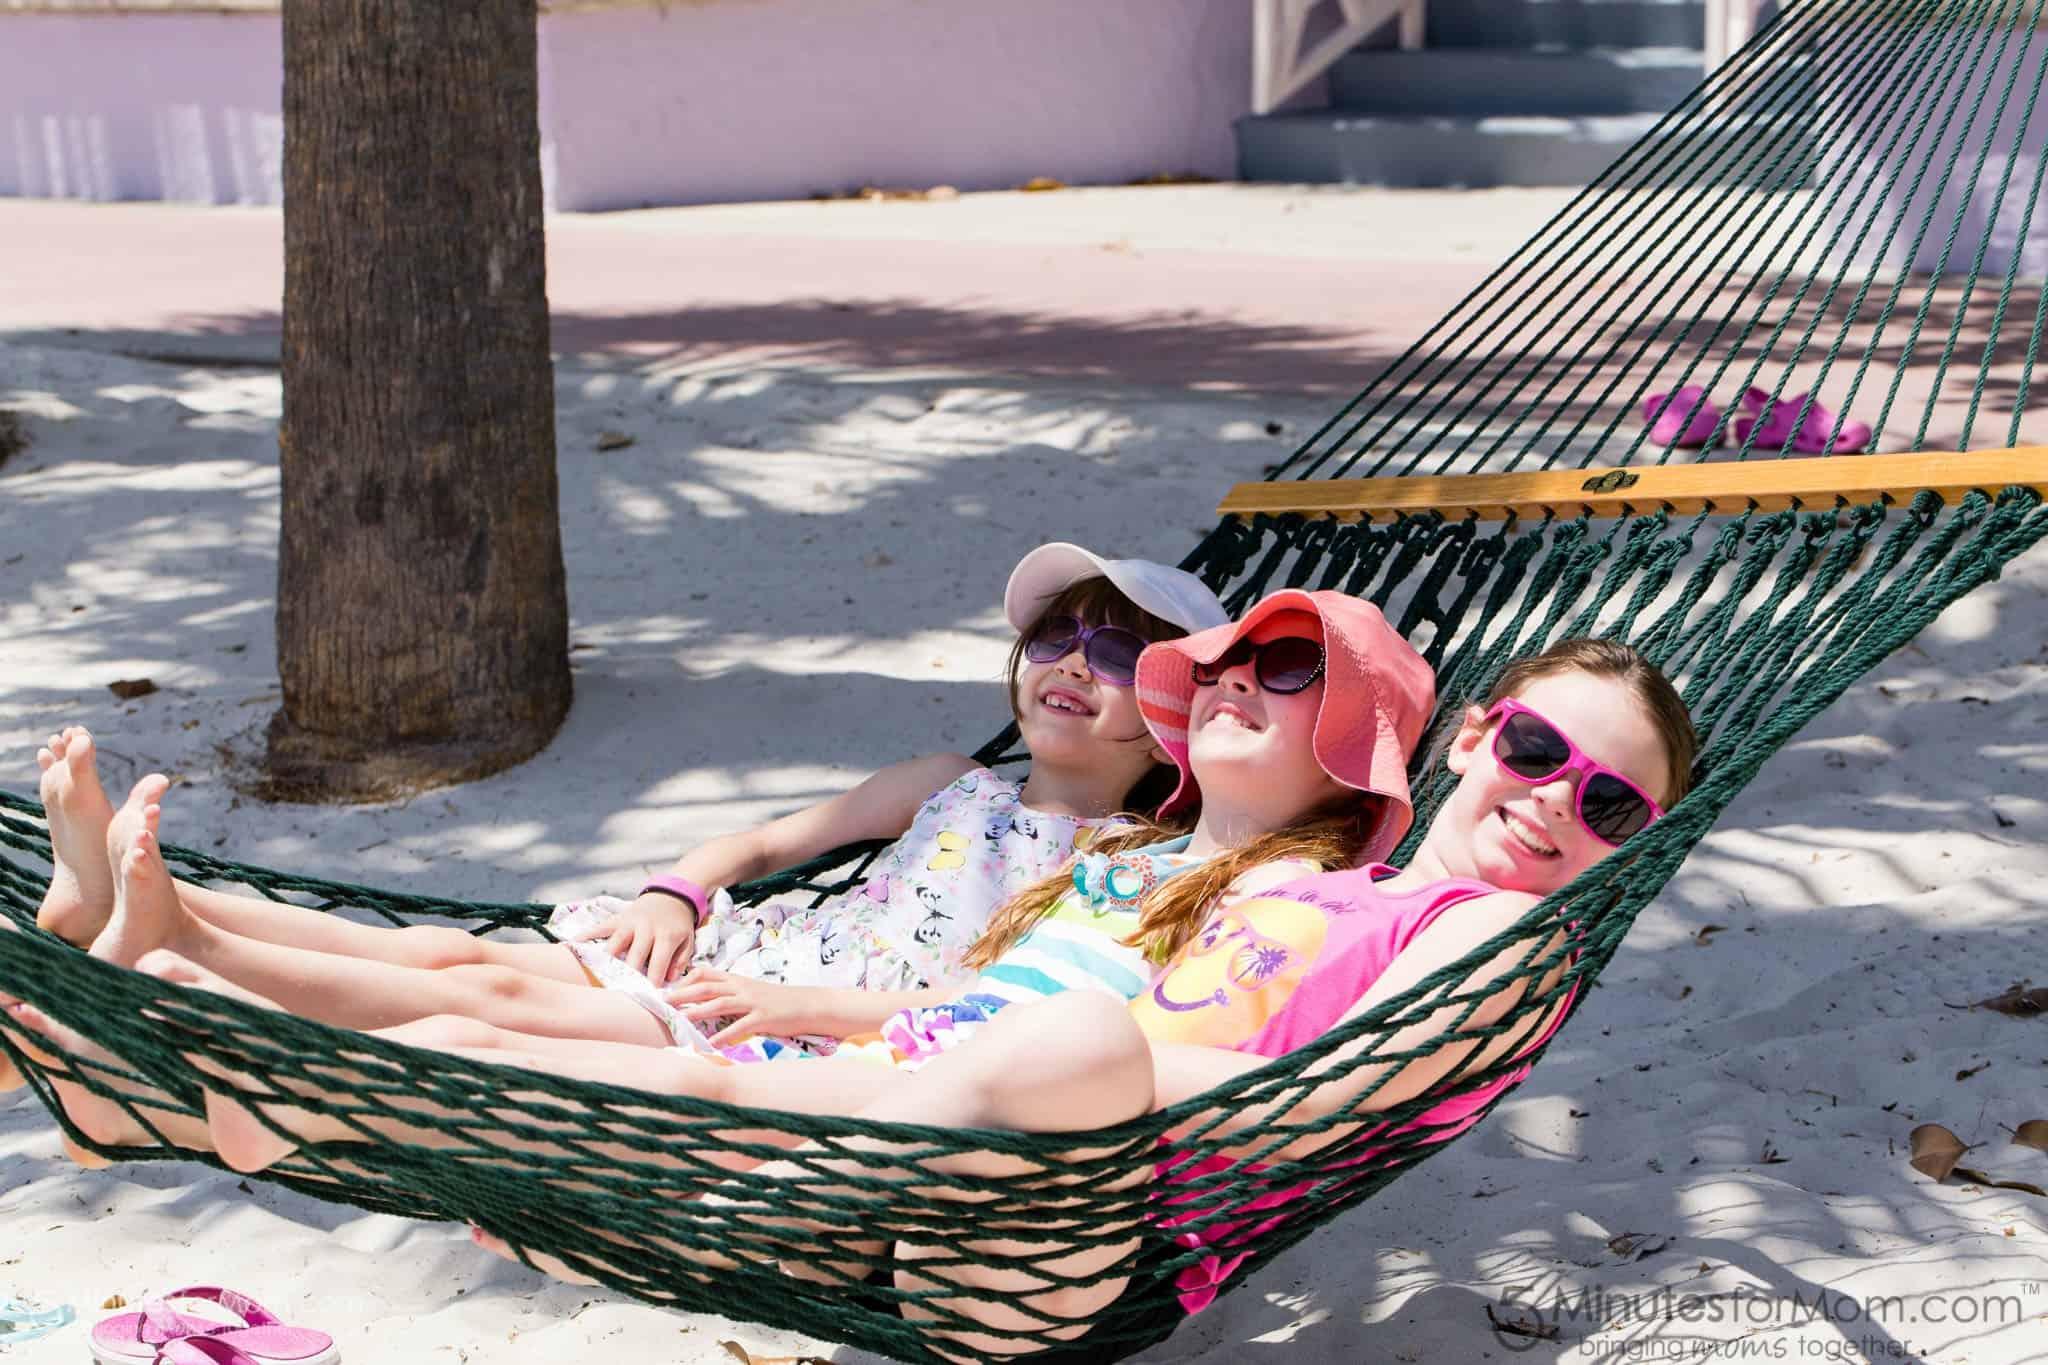 Life is better in a hammock